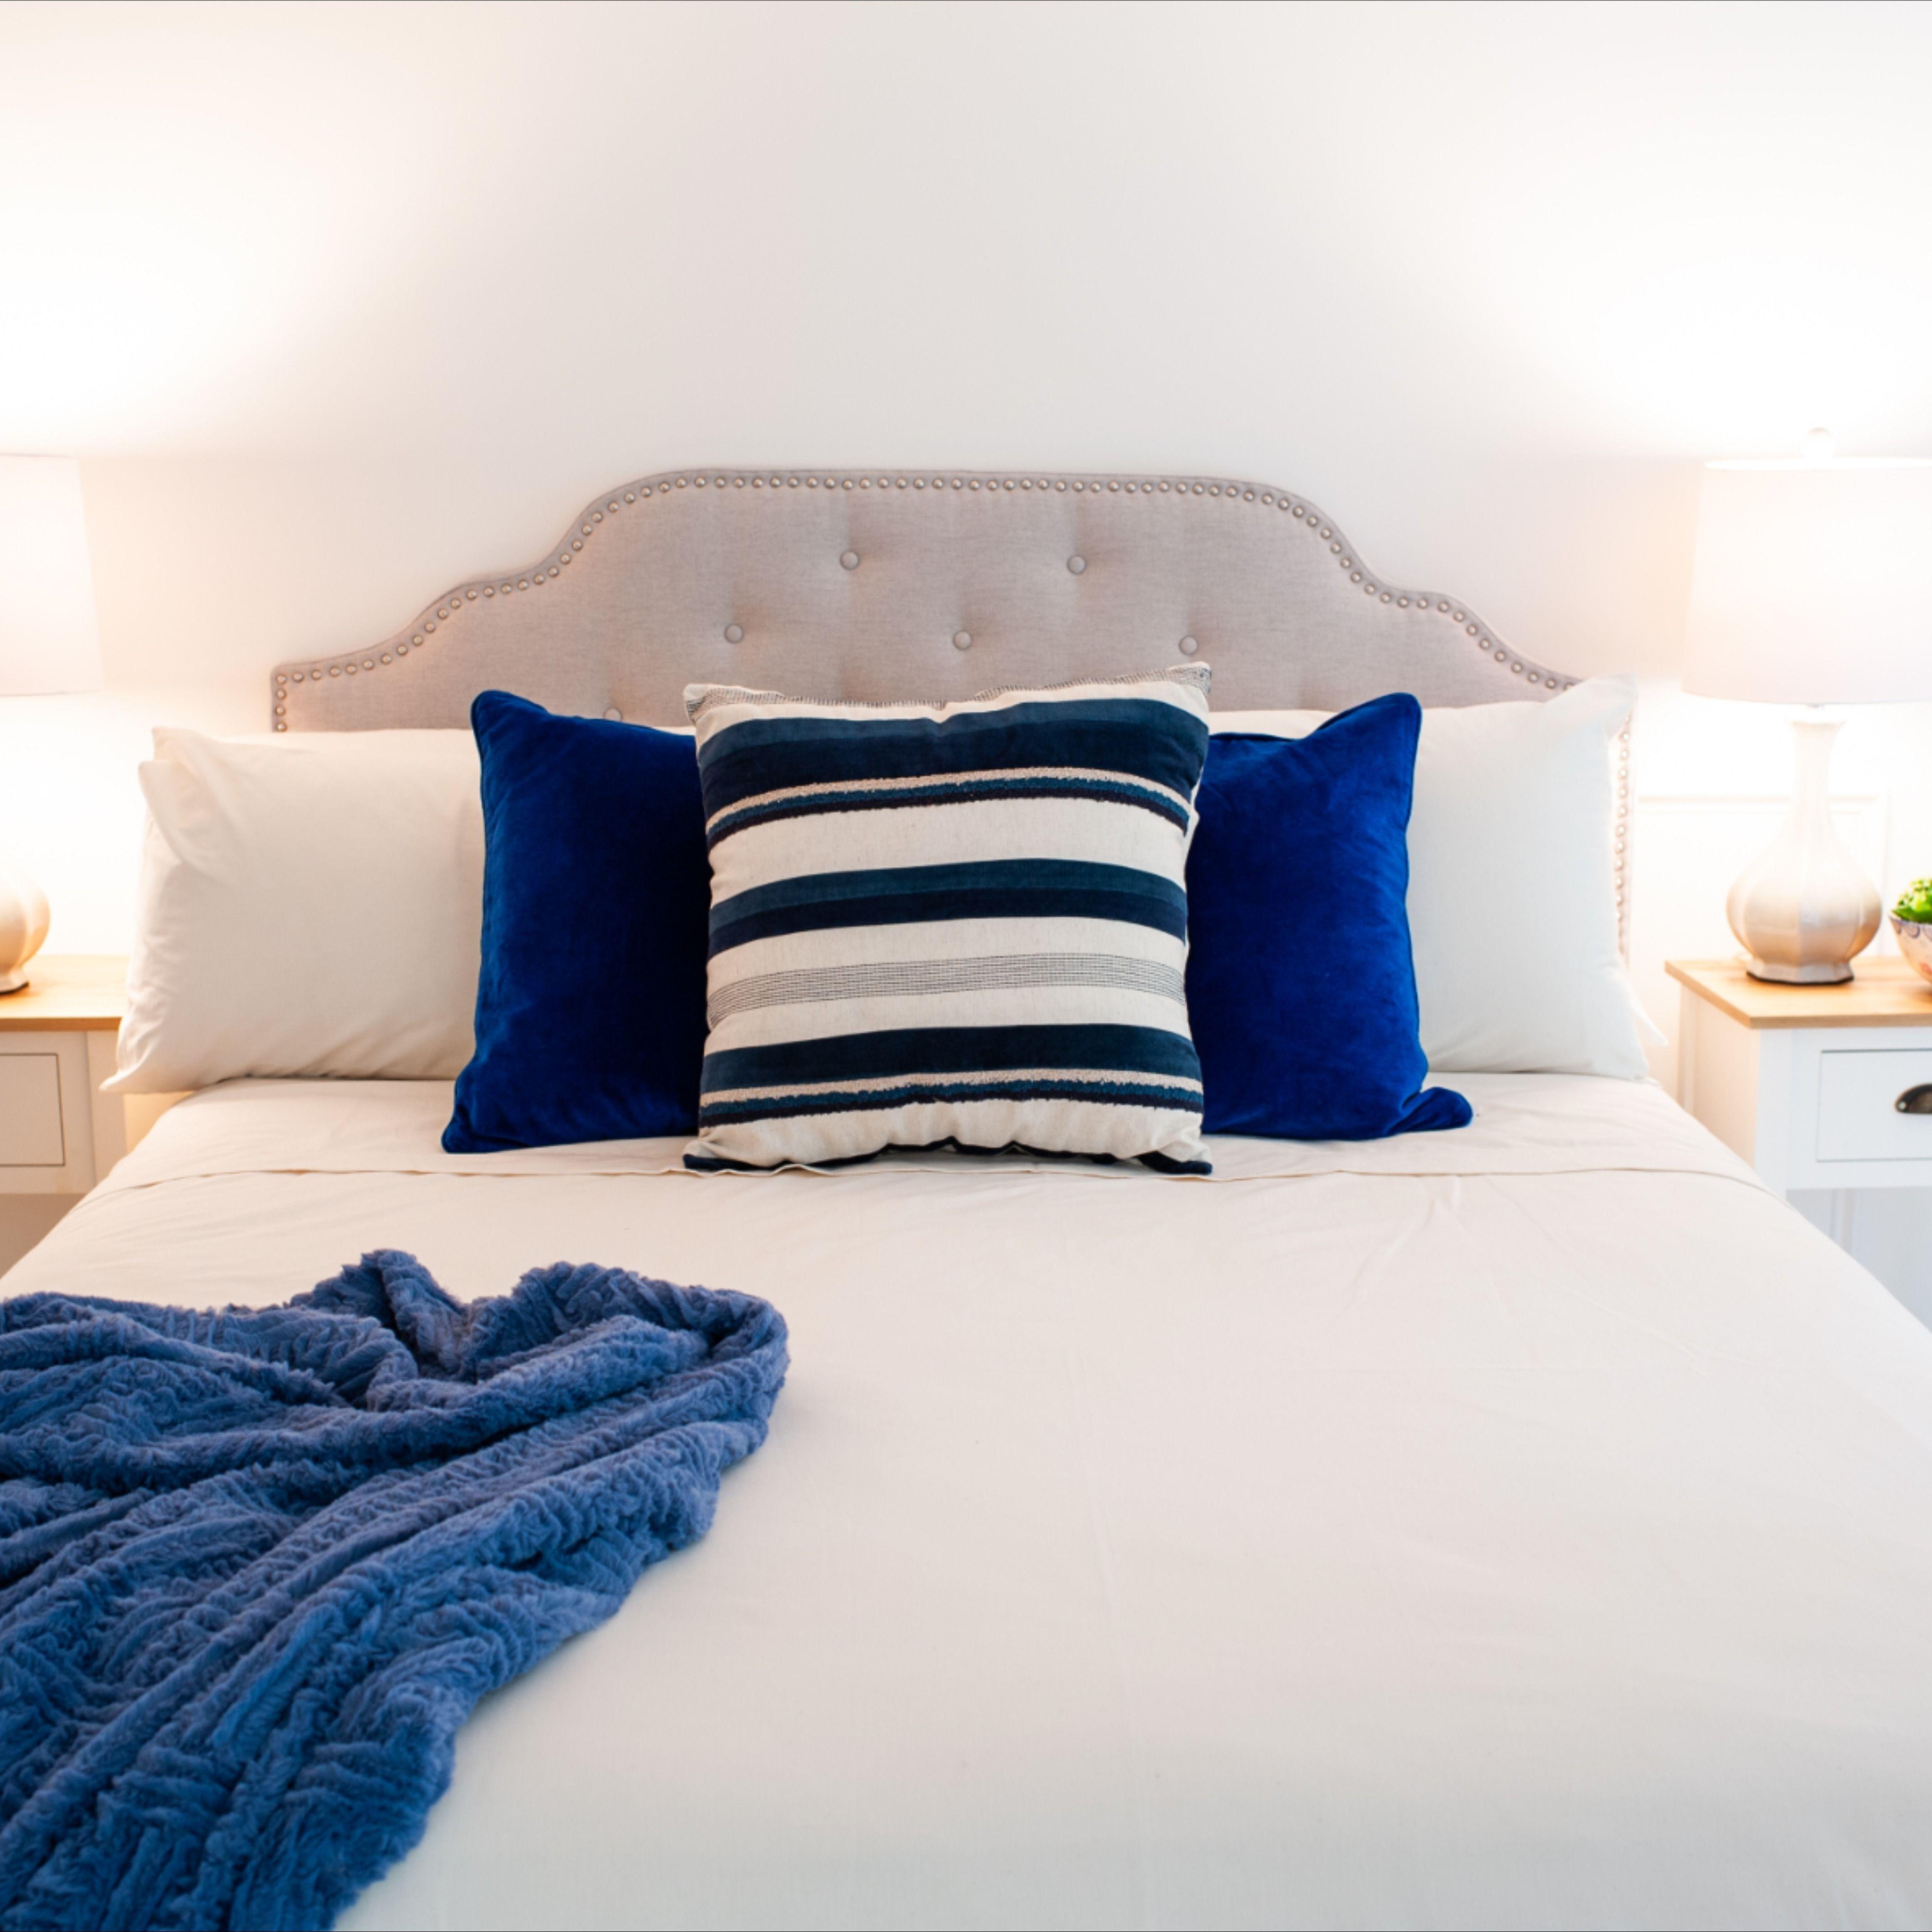 Classic American Made Organic Cotton Sheets Organic Cotton Bed Sheets Organic Cotton Sheets Classic Sheets American made bed sheets